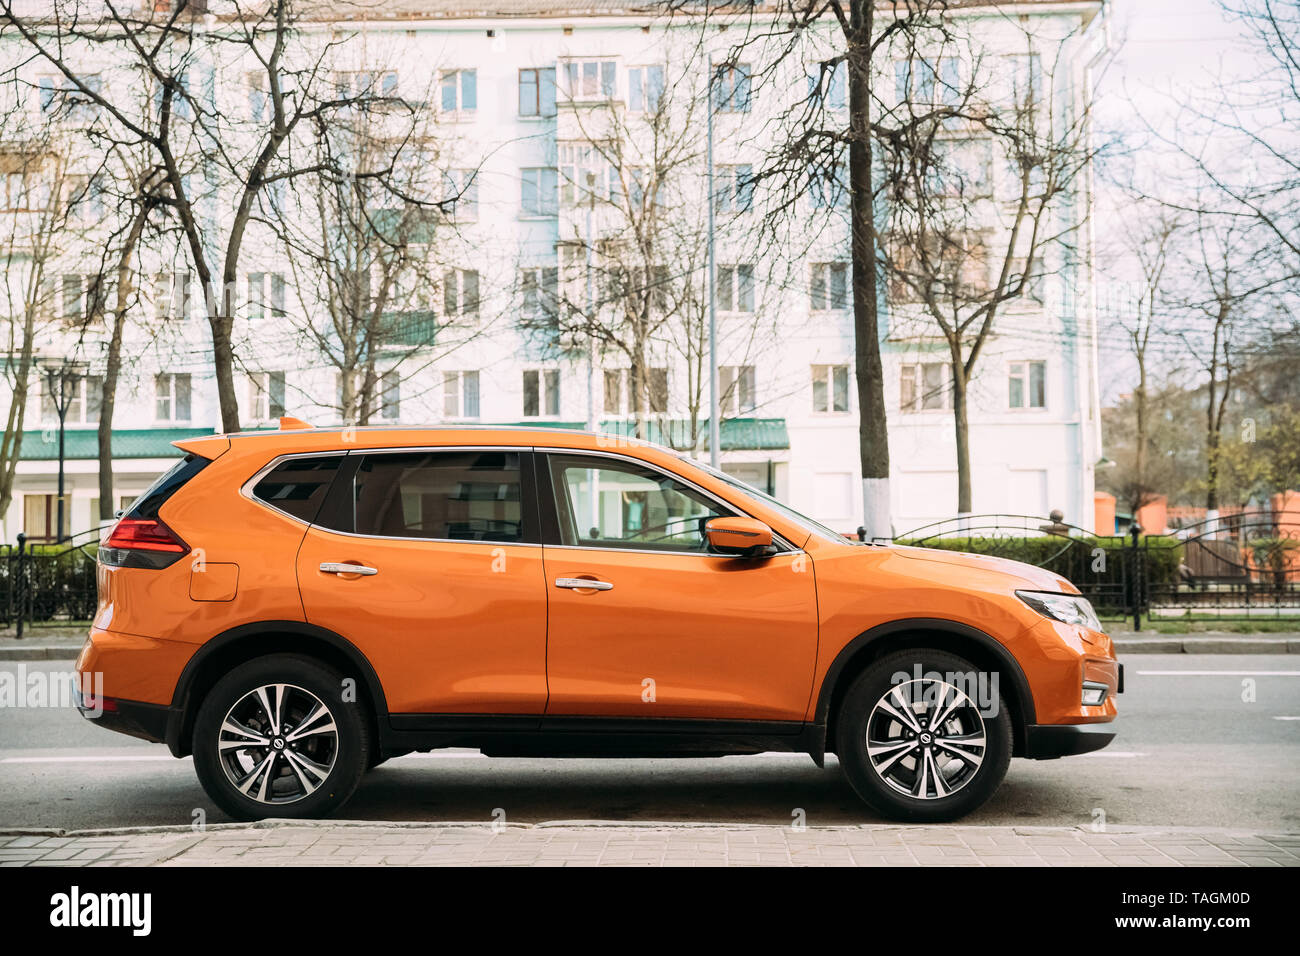 Gomel, Belarus - April 16, 2019: Orange Nissan X-Trail third generation Car Parked At Street. Side View - Stock Image